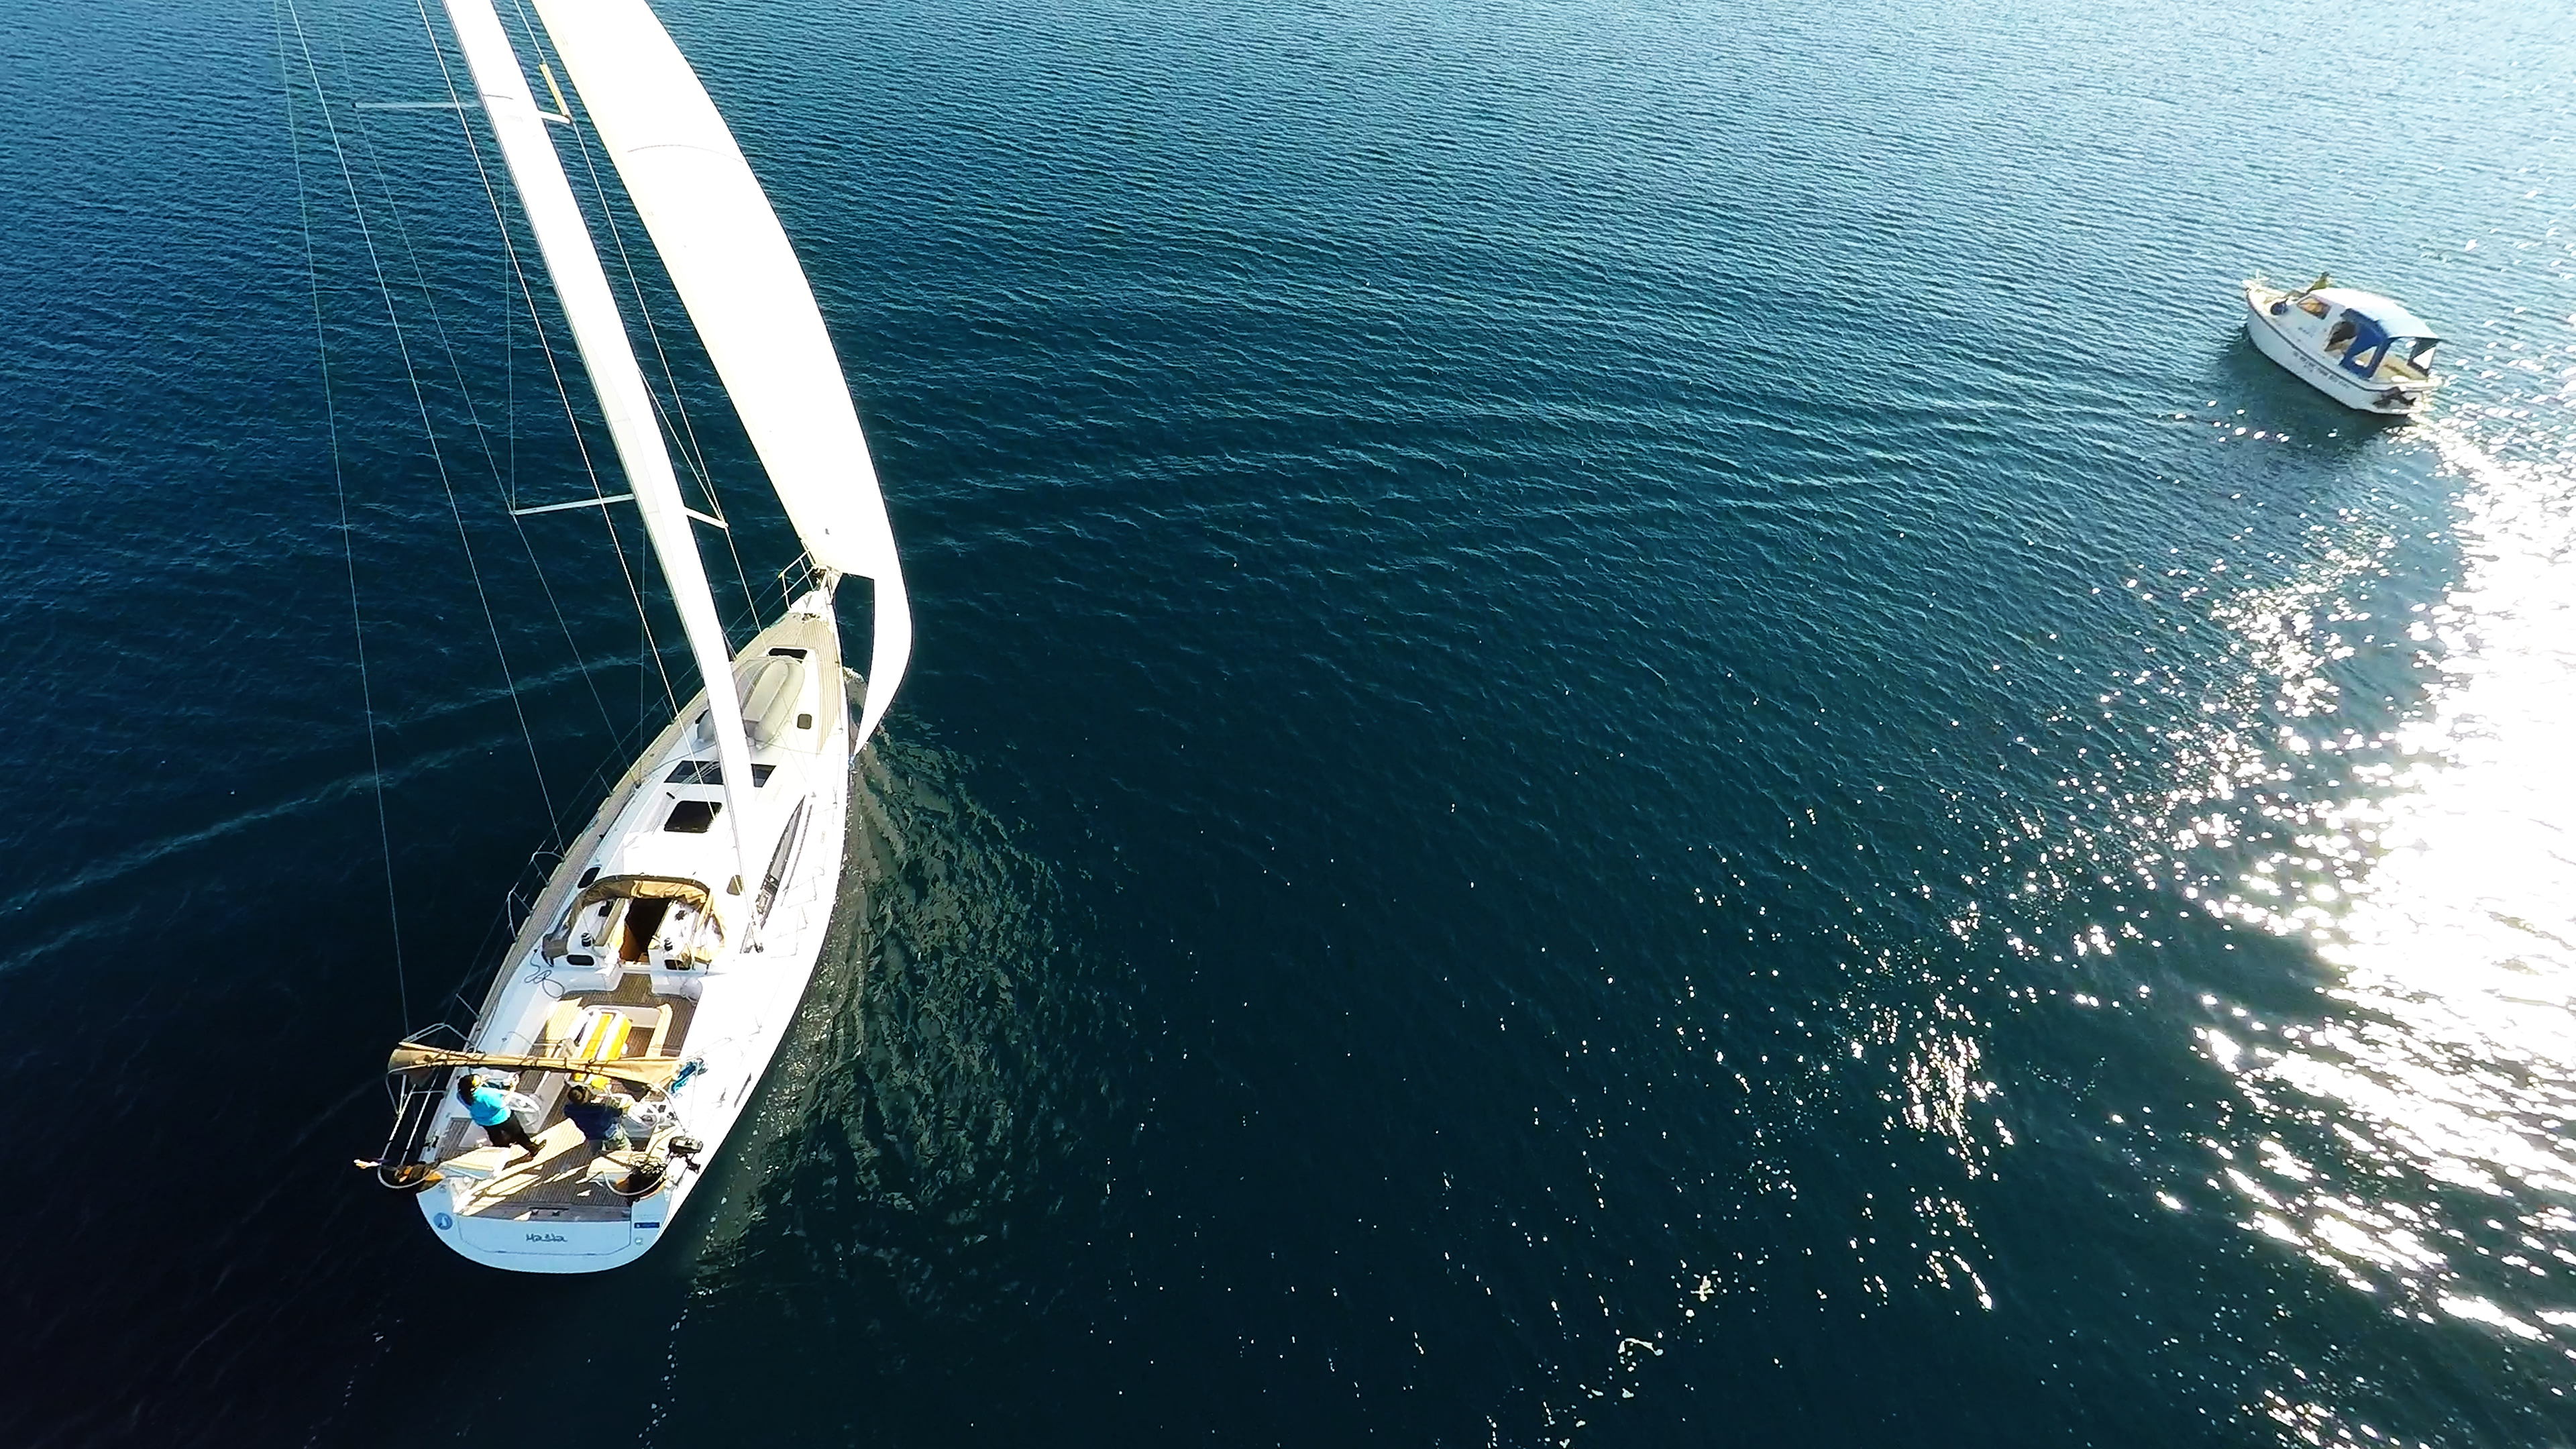 barcha a vela barca a vela accanto alla barca a motoree a vela blu mare